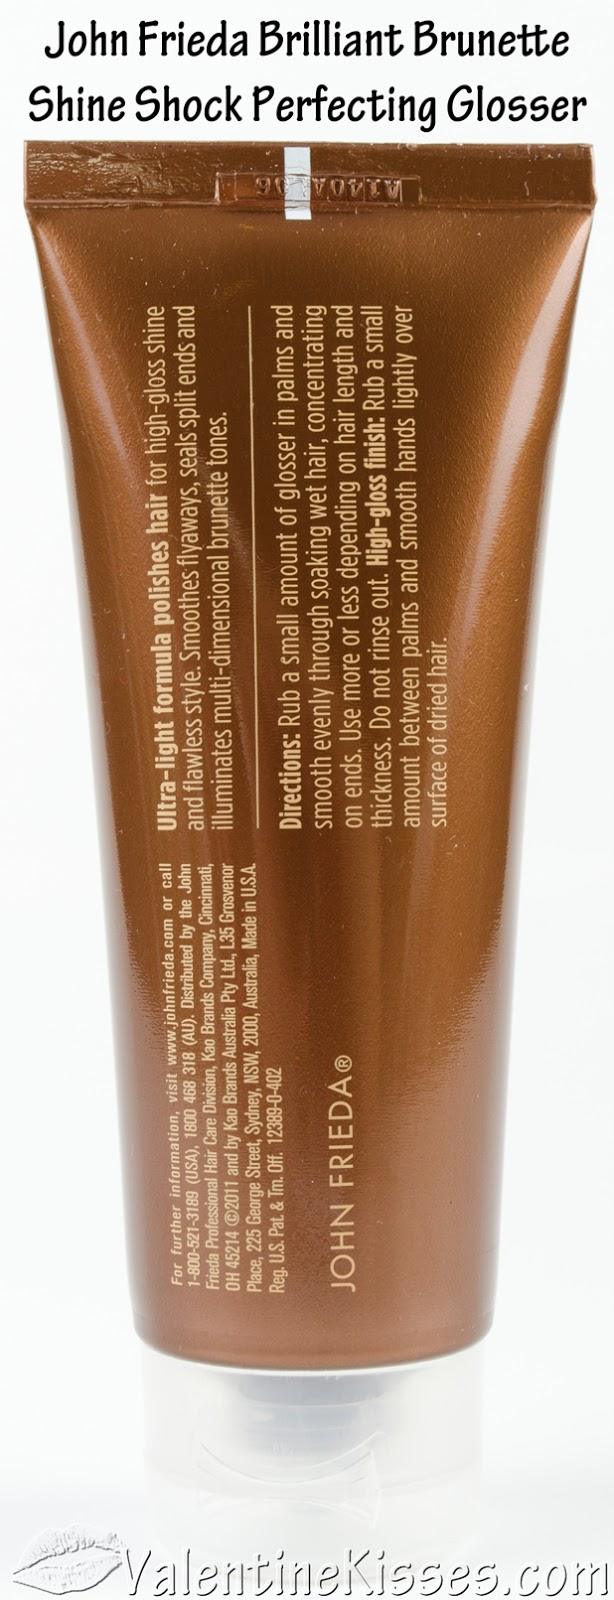 Brilliant brunette shine shock leave on perfecting glosser